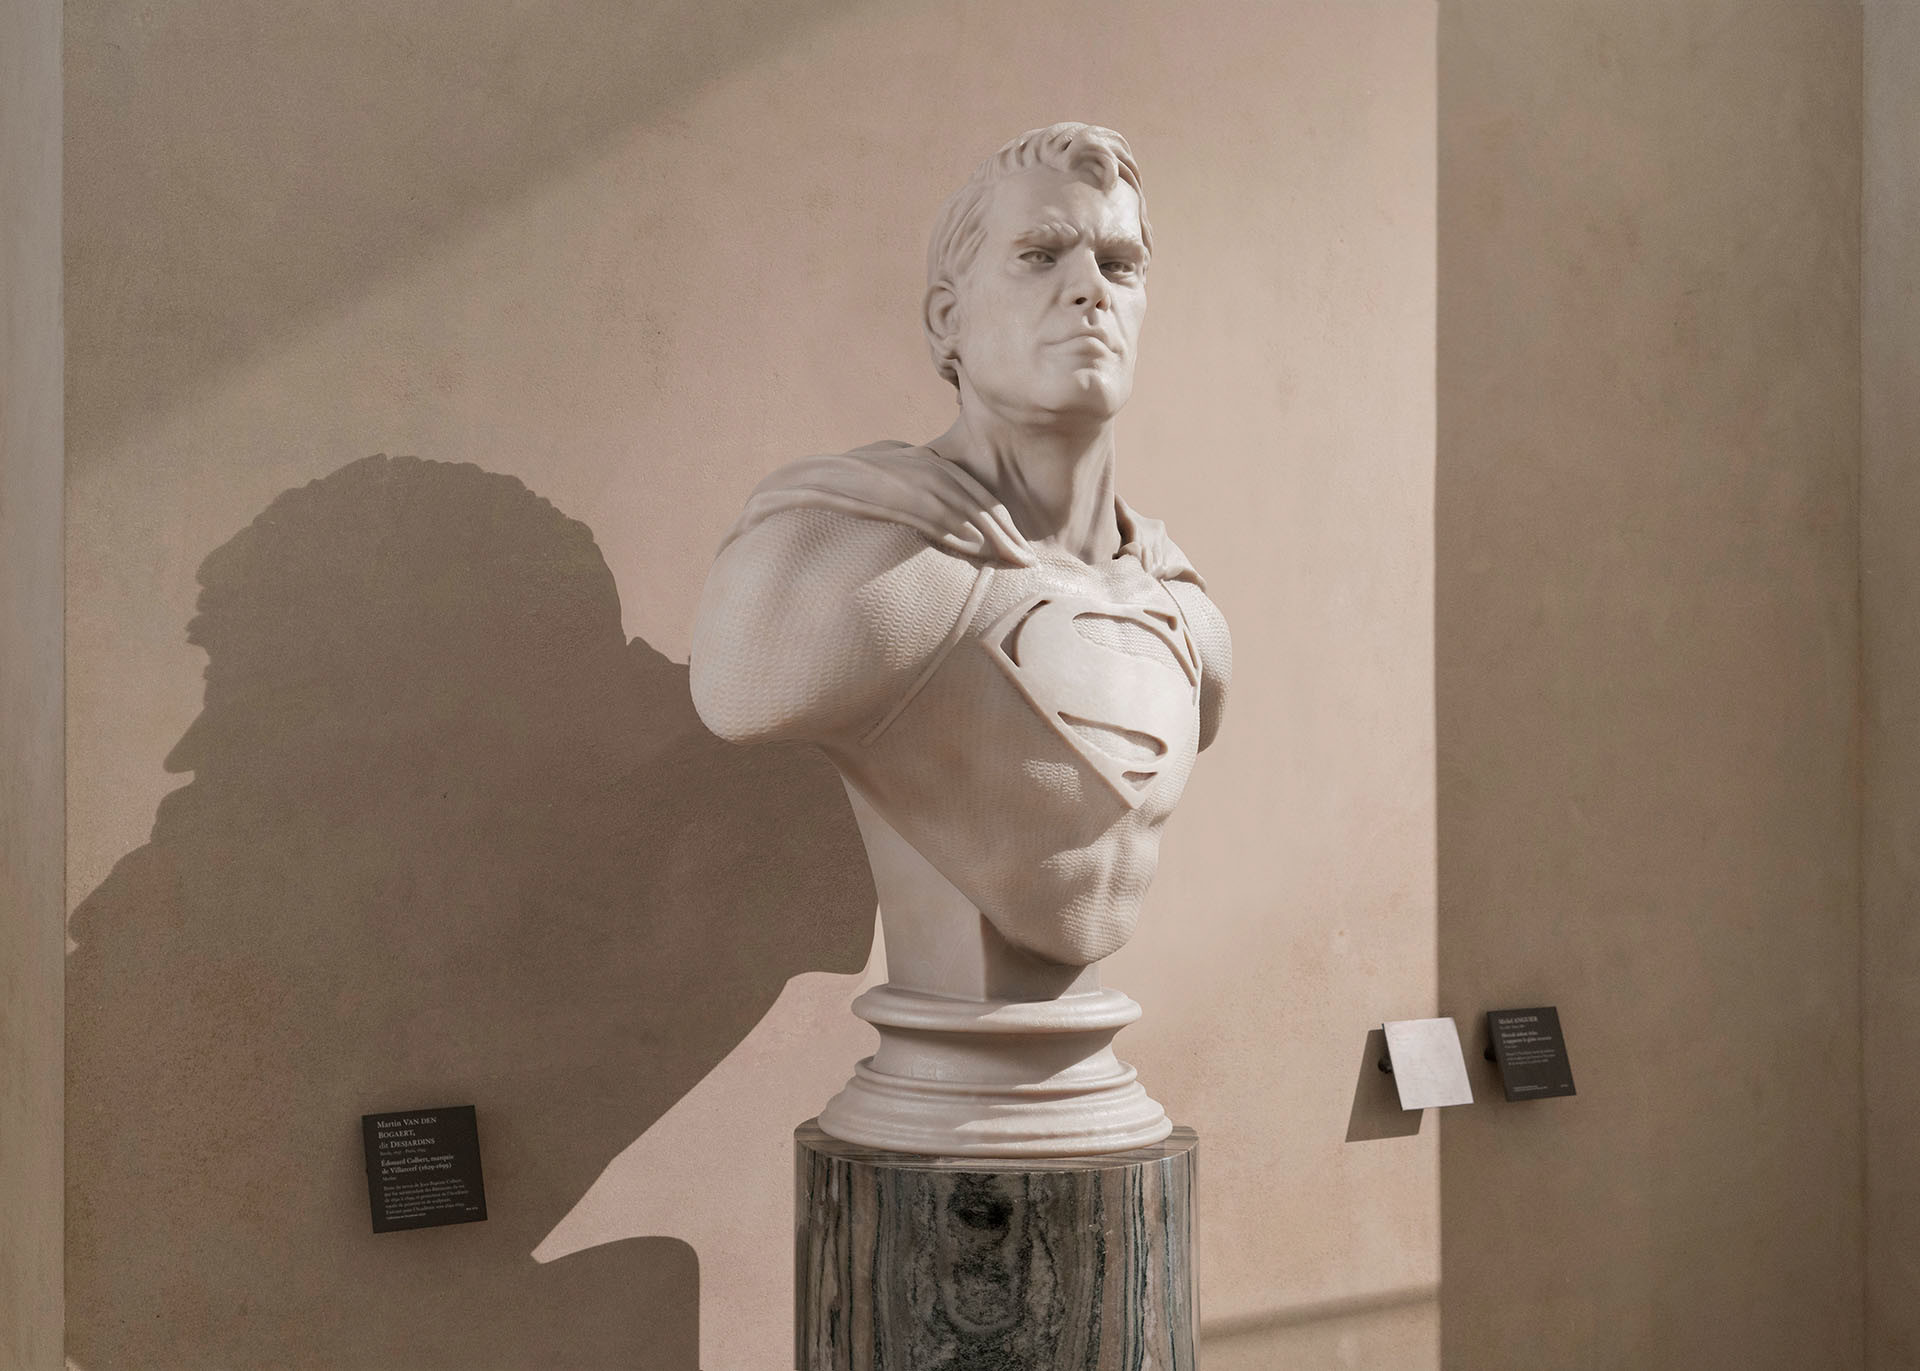 Peter kolus superman